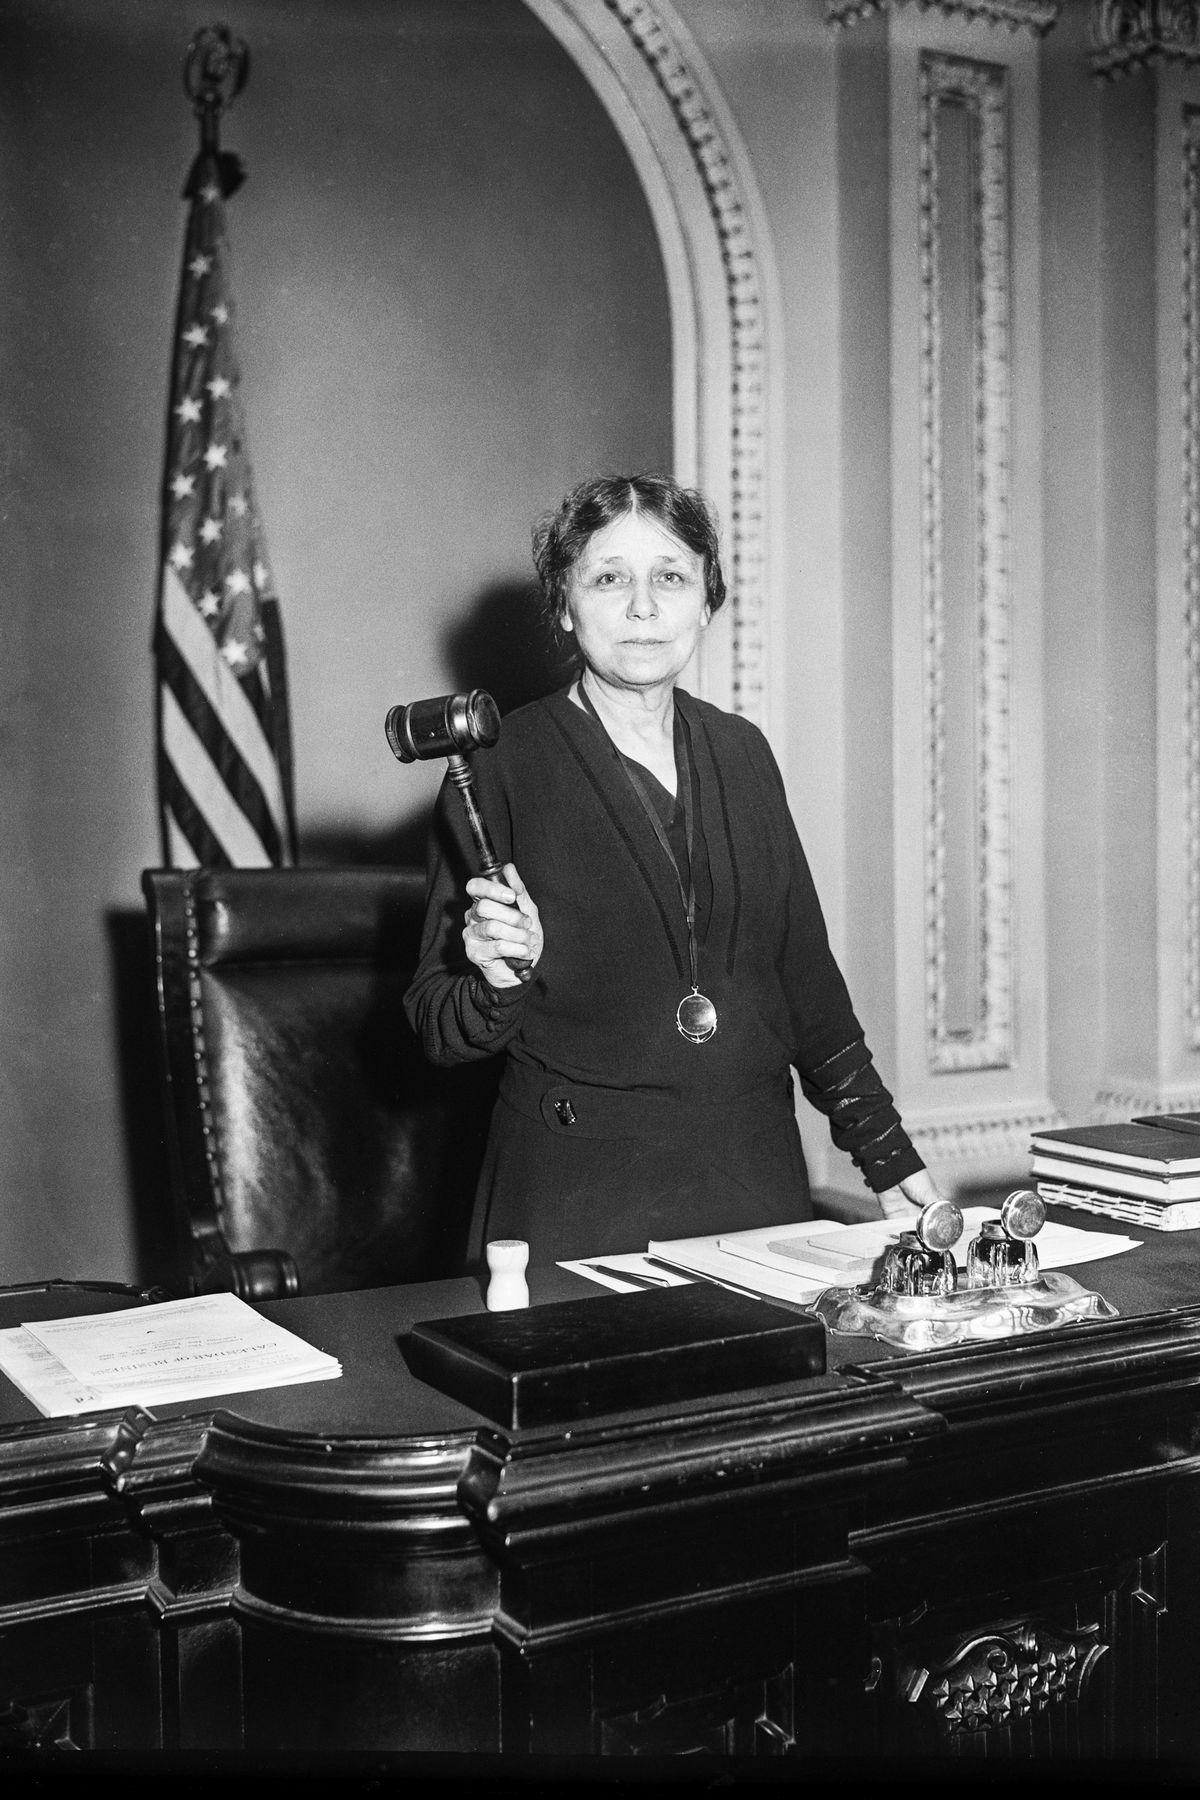 Sen. Hattie Caraway (R-AR), the first woman elected to serve as a US Senator, circa 1932